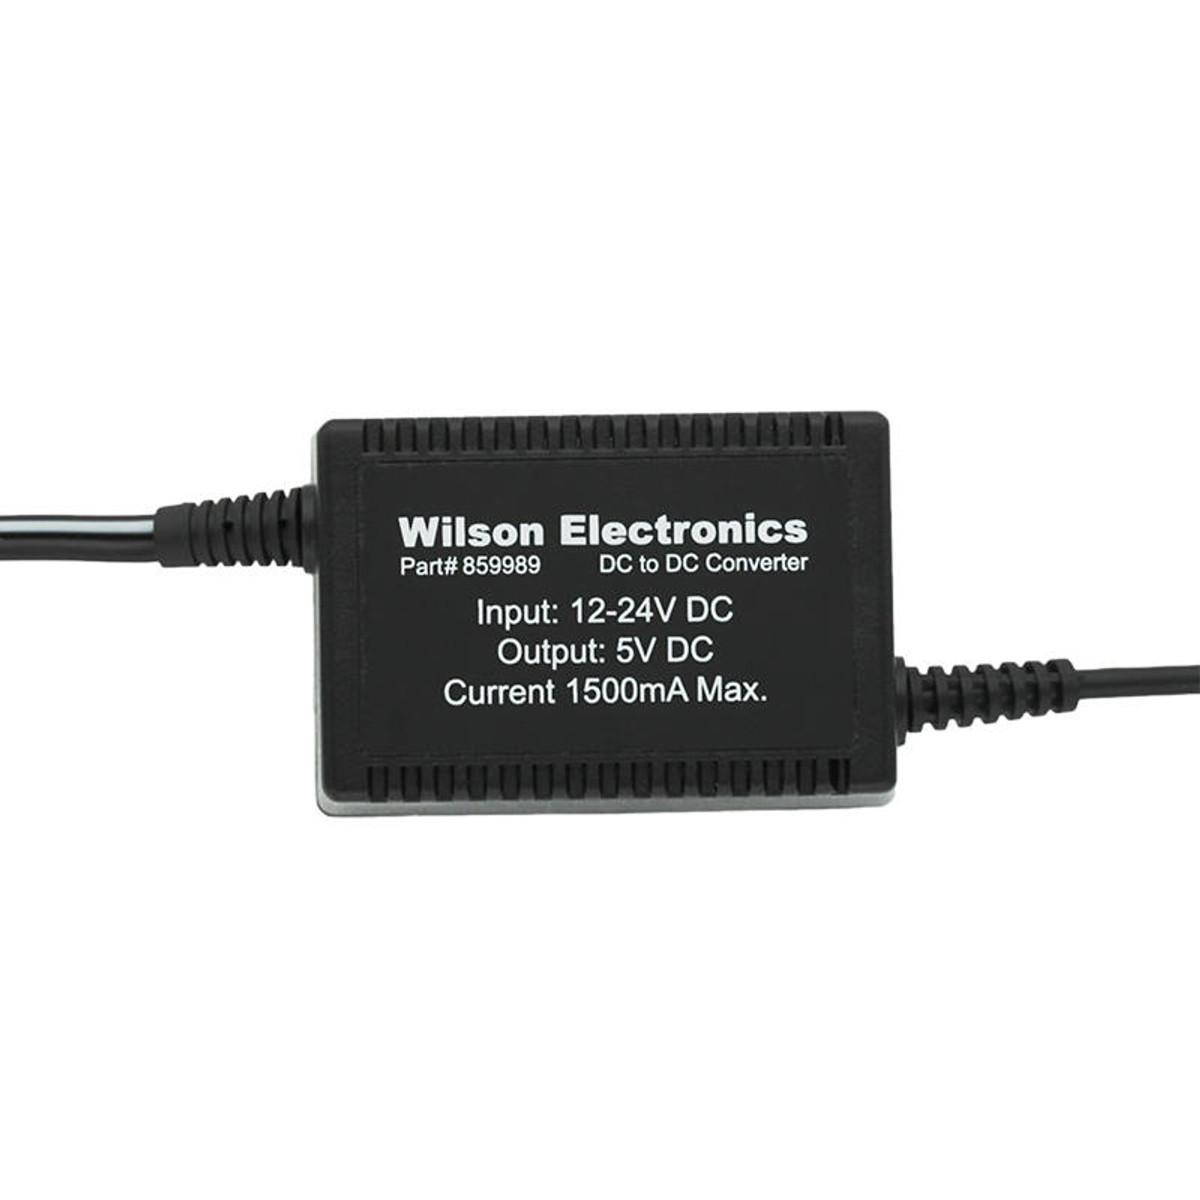 Wilson Electronics weBoost Wilson 859989 5V DC Vehicle Hardwire Power Supply